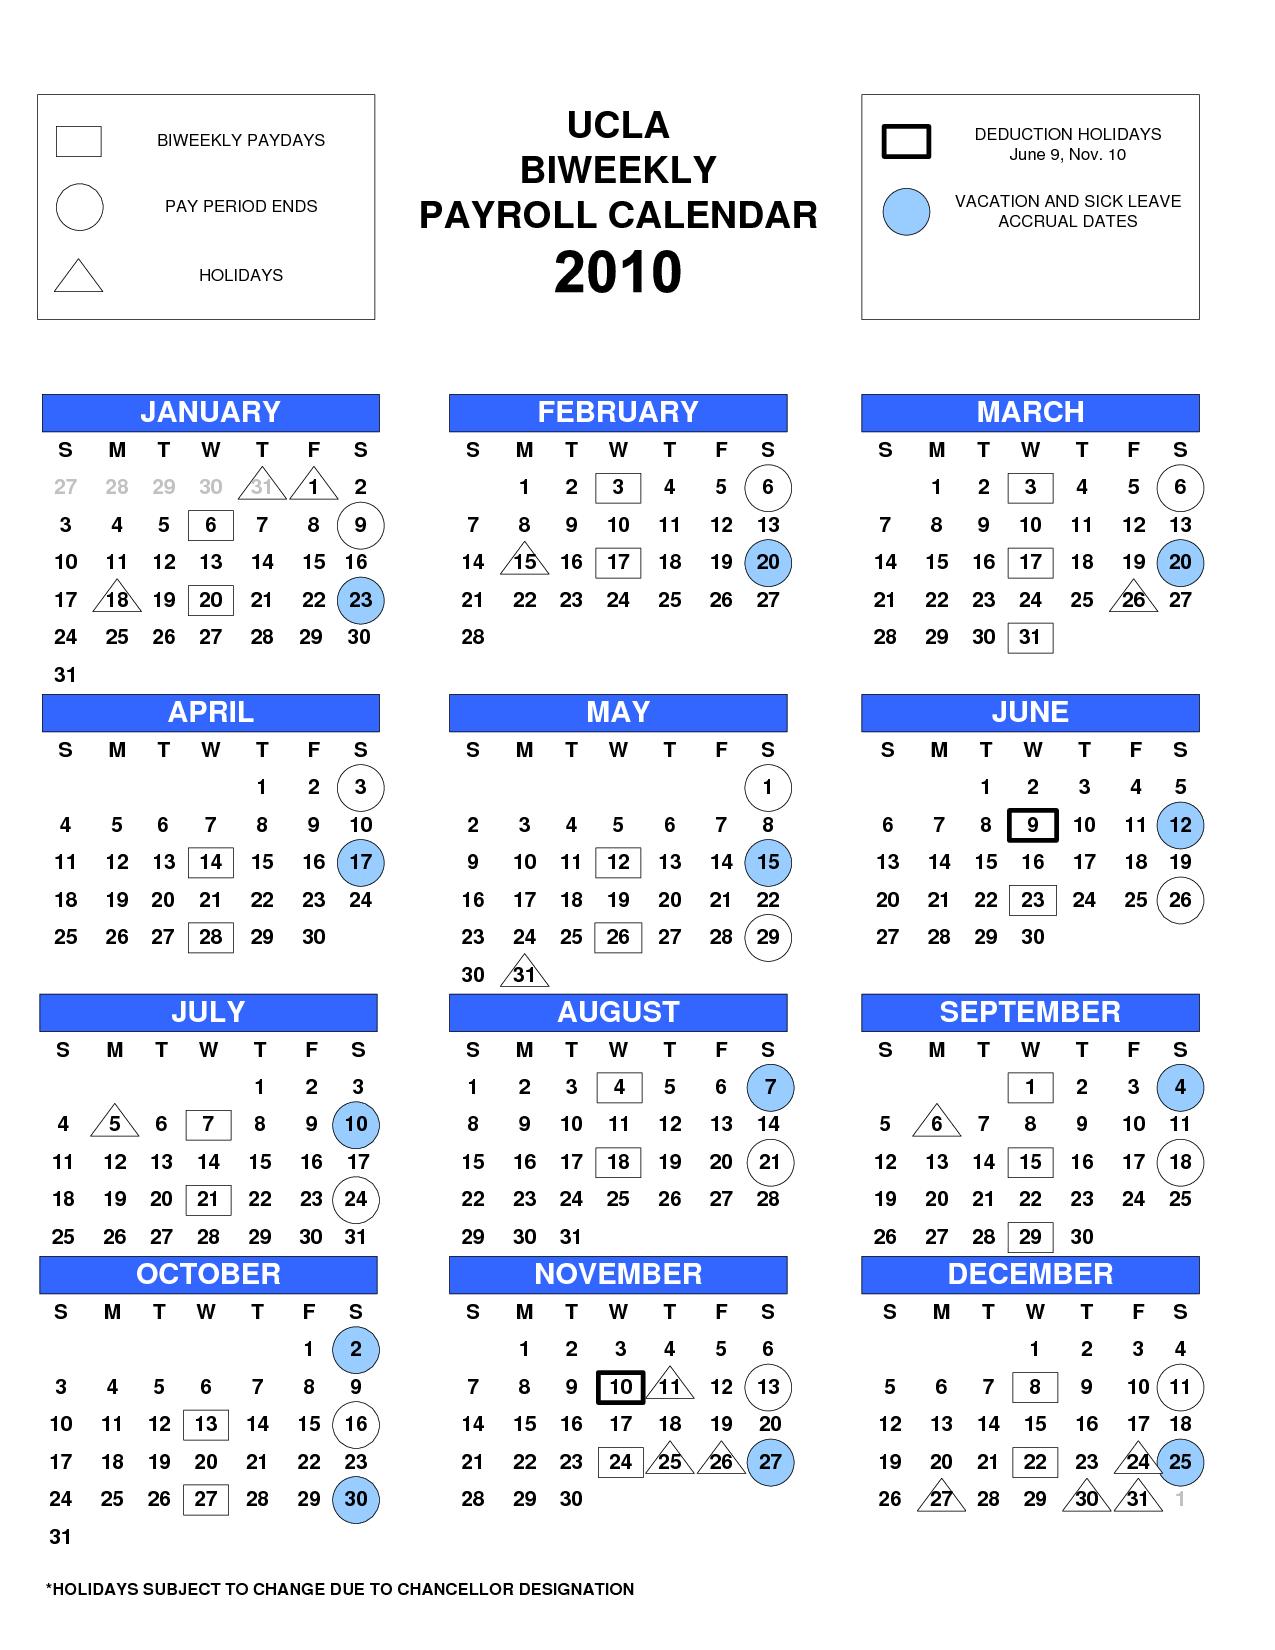 Uc Payroll Calendar 2018 | Payroll Calendars inside Uc Berkeley Payroll Calendar 2020